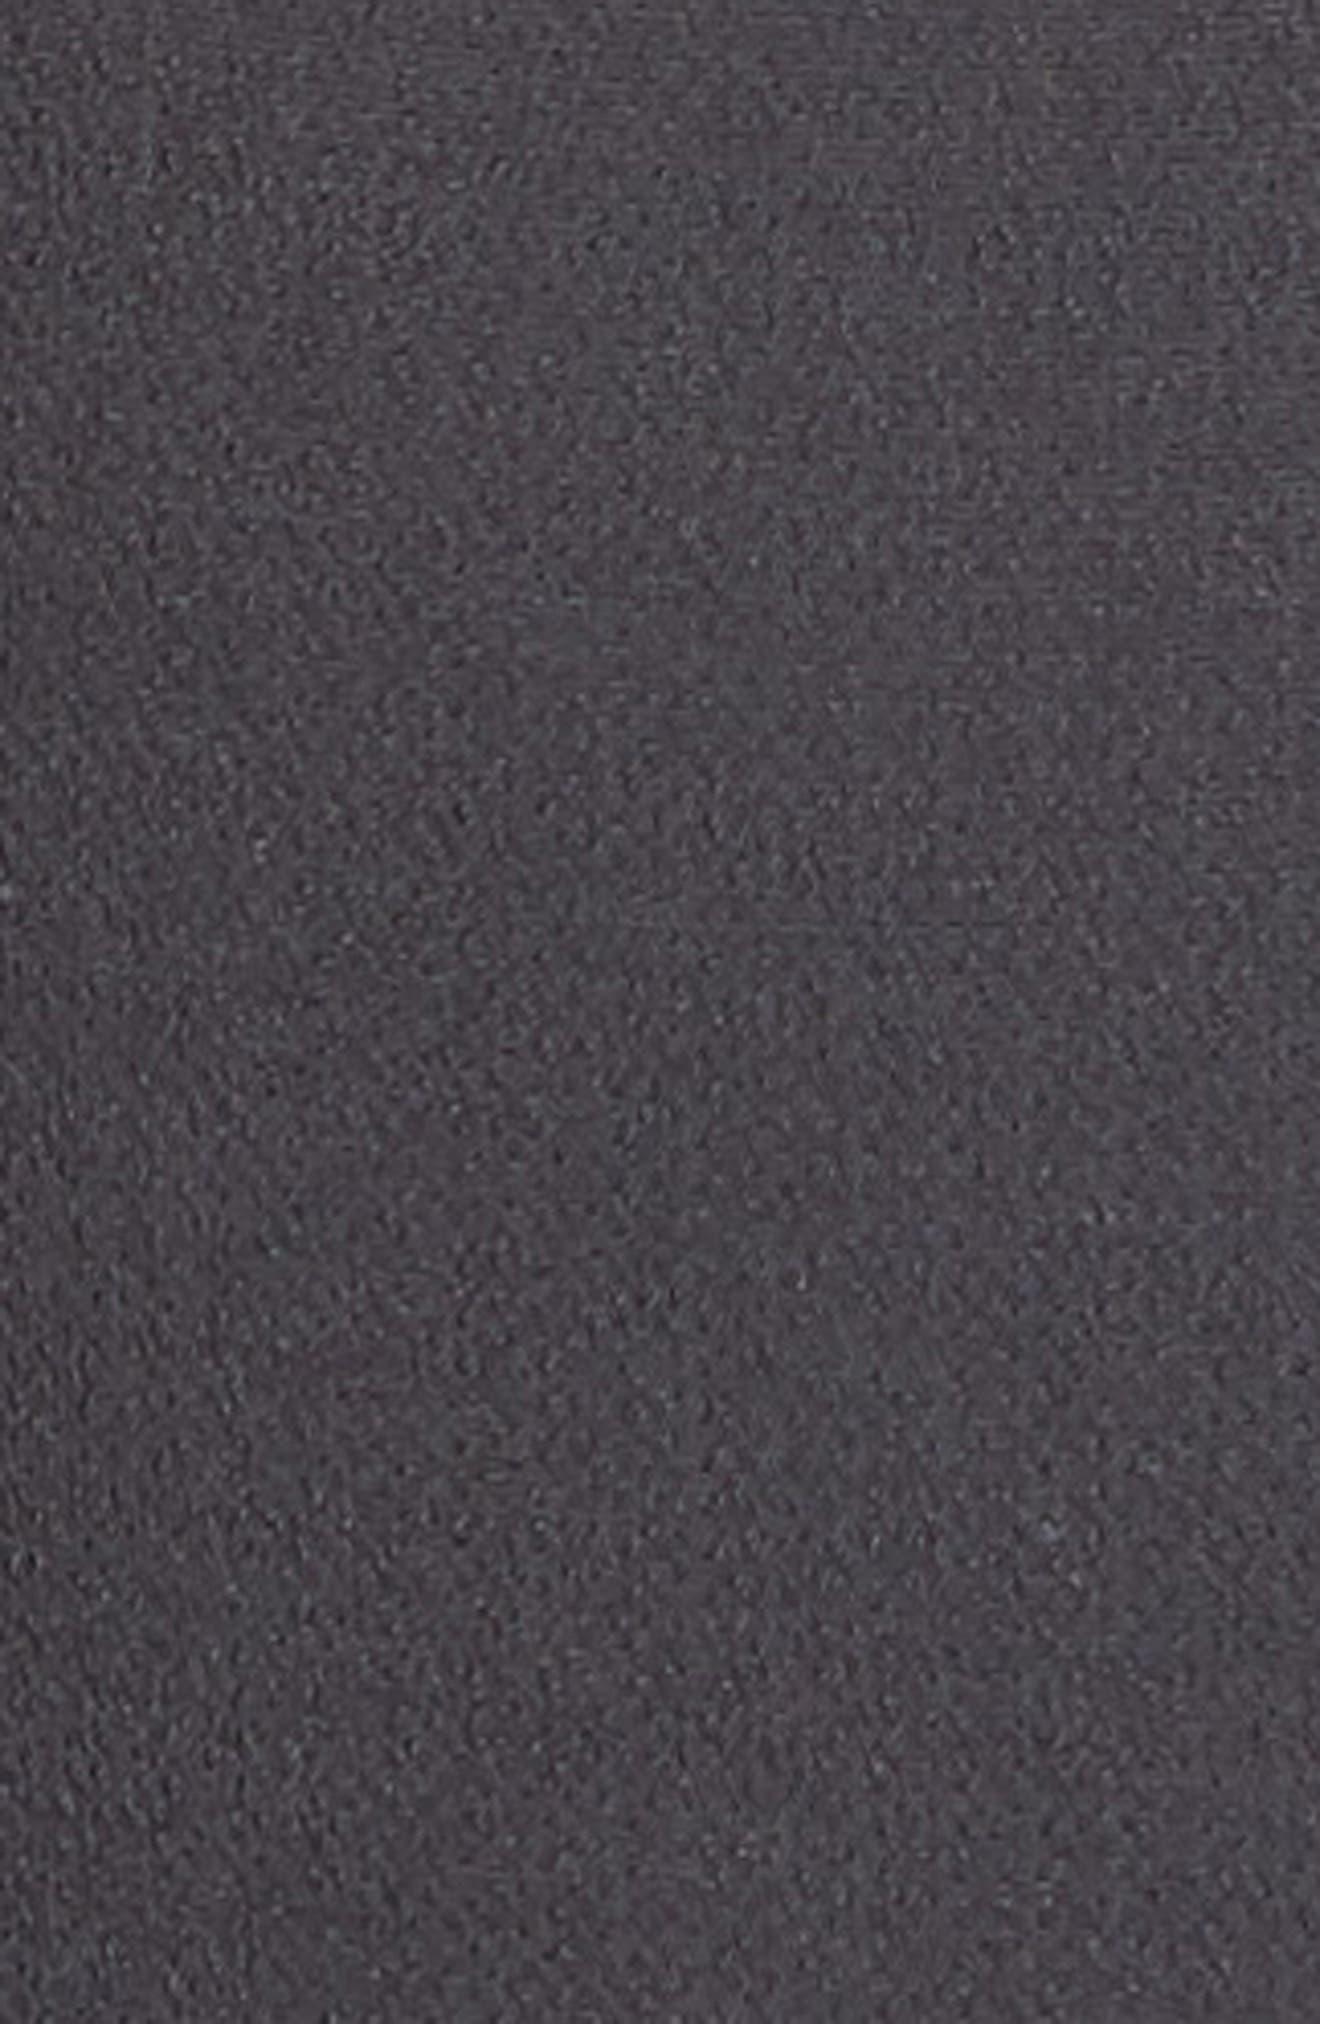 Jumpshot Slim Track Pants,                             Alternate thumbnail 5, color,                             VINTAGE BLACK